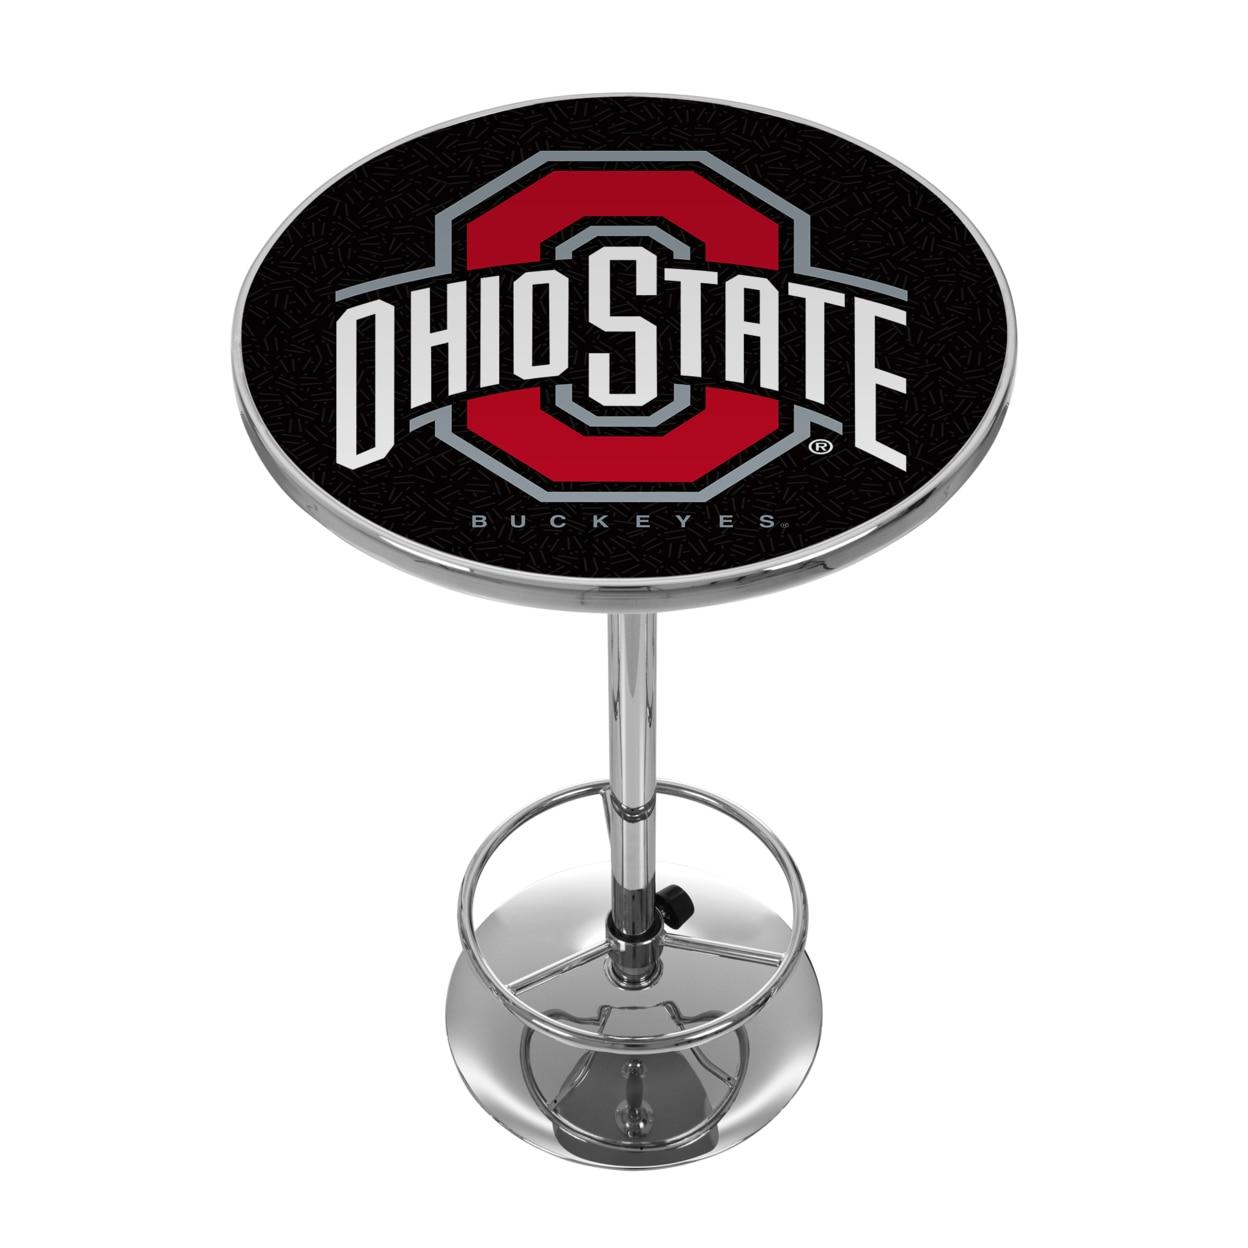 The Ohio State University 42 Inch Pub Table - Black ботинки meindl meindl ohio 2 gtx® женские